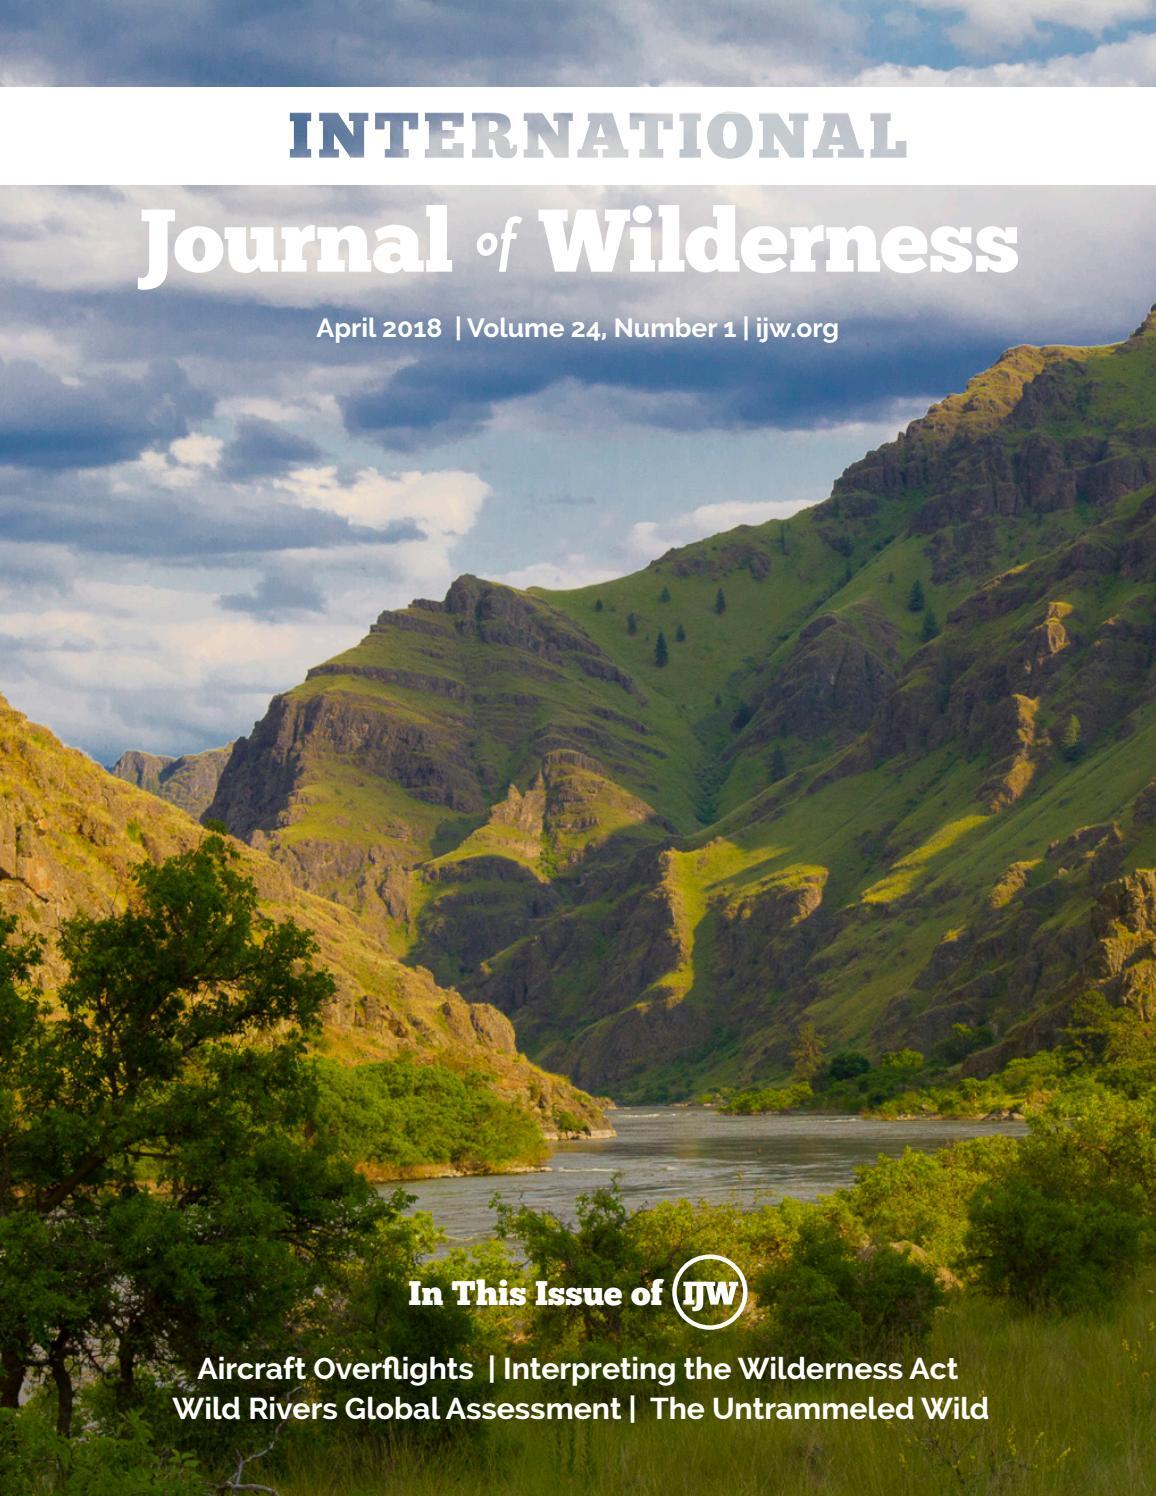 International Journal of Wilderness: Volume 24, No 1, April